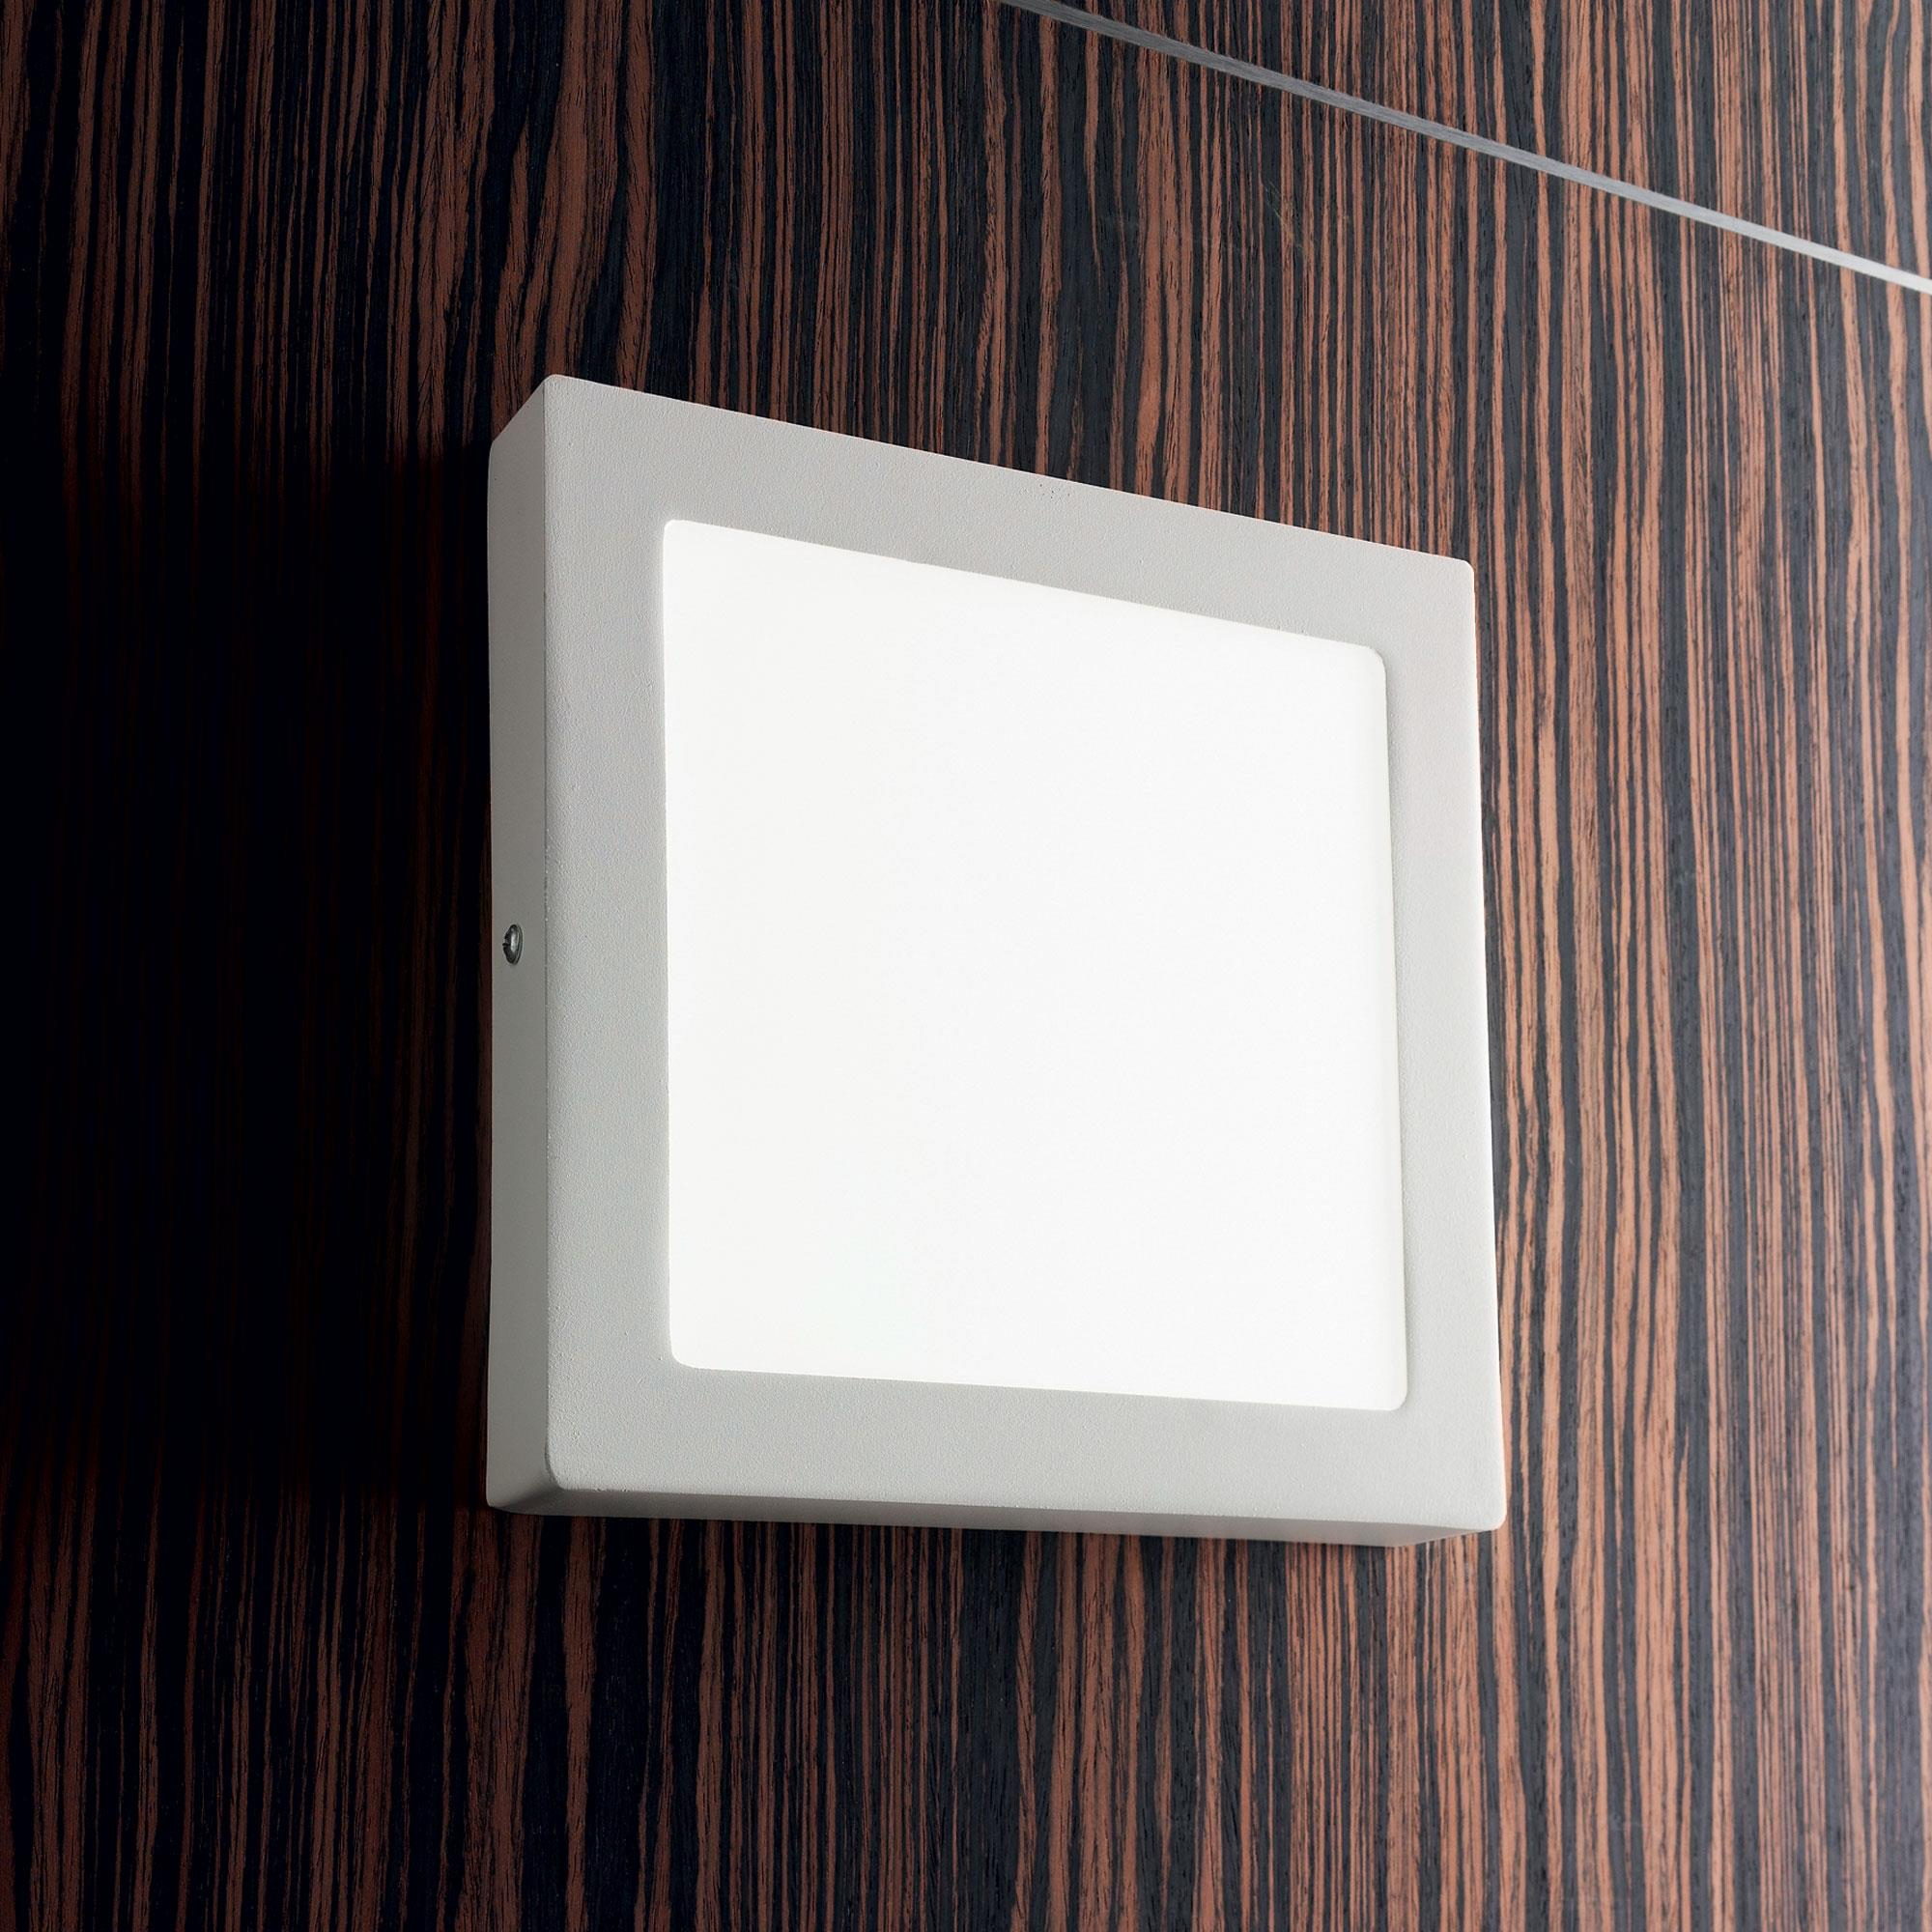 Ideal Lux 138657 UNIVERSAL 24W SQUARE BIANCO LED mennyezeti / fali lámpa